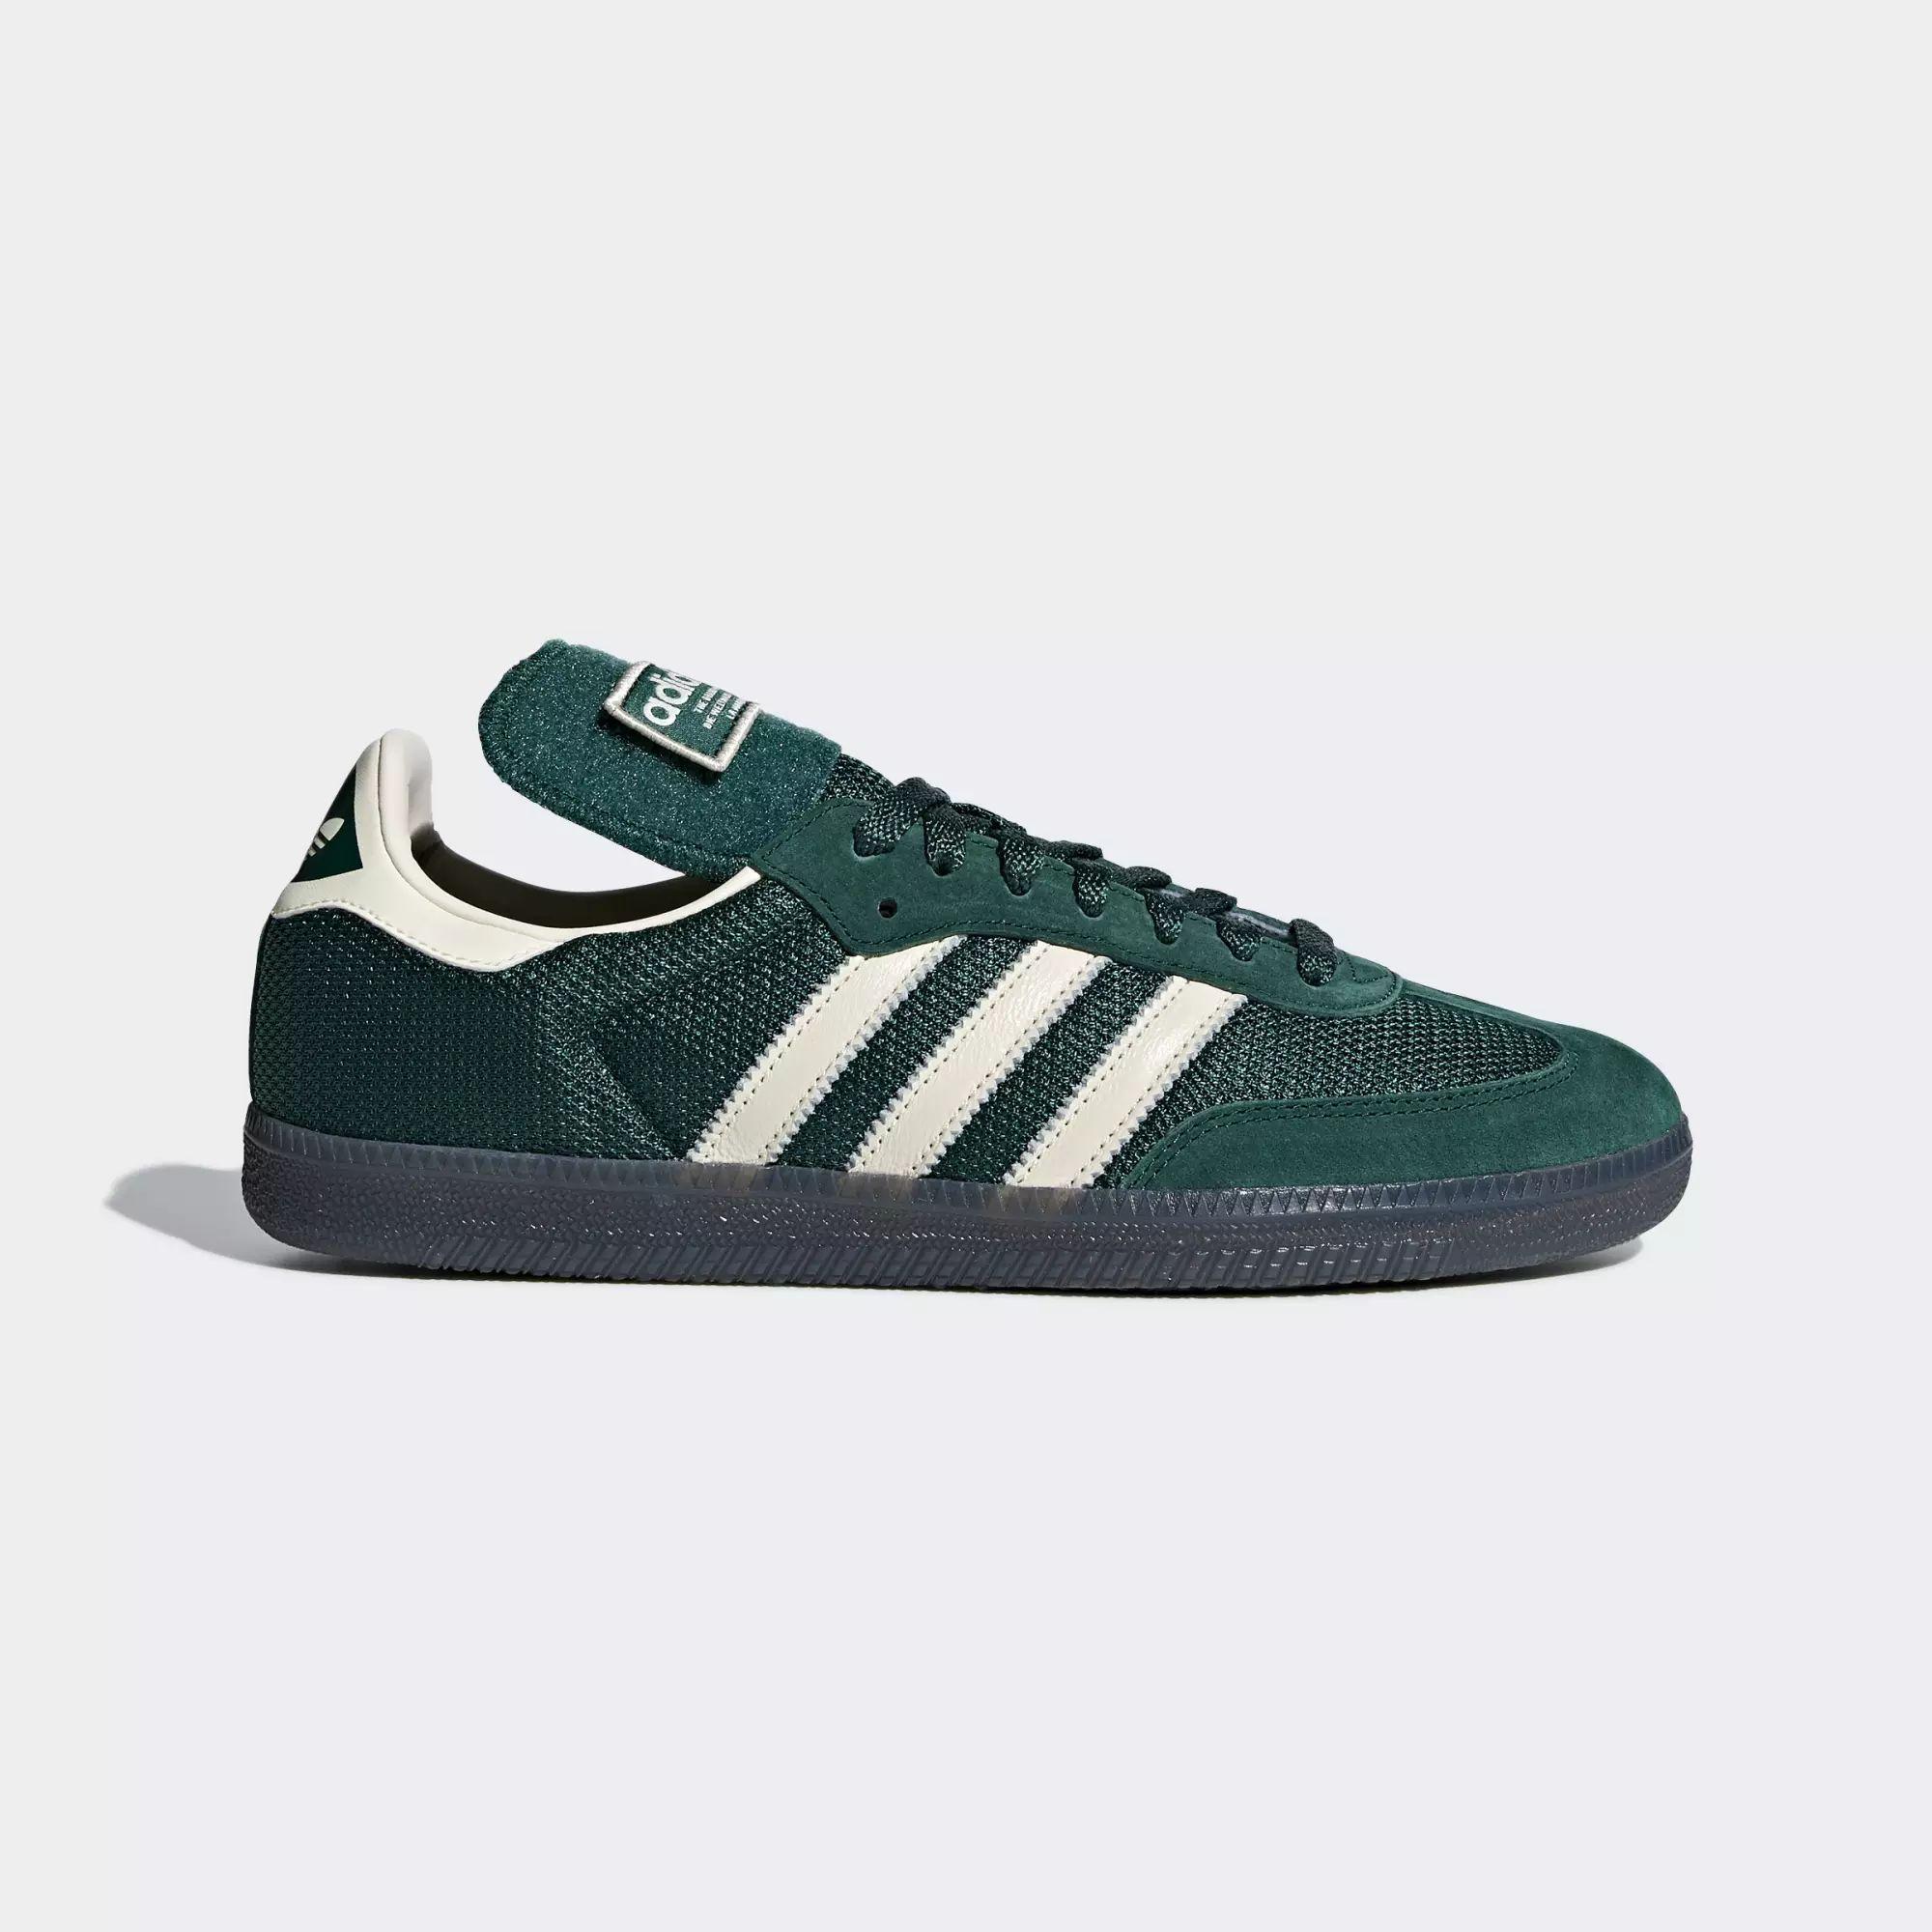 Adidas Samba LT Shoes - Collegiate